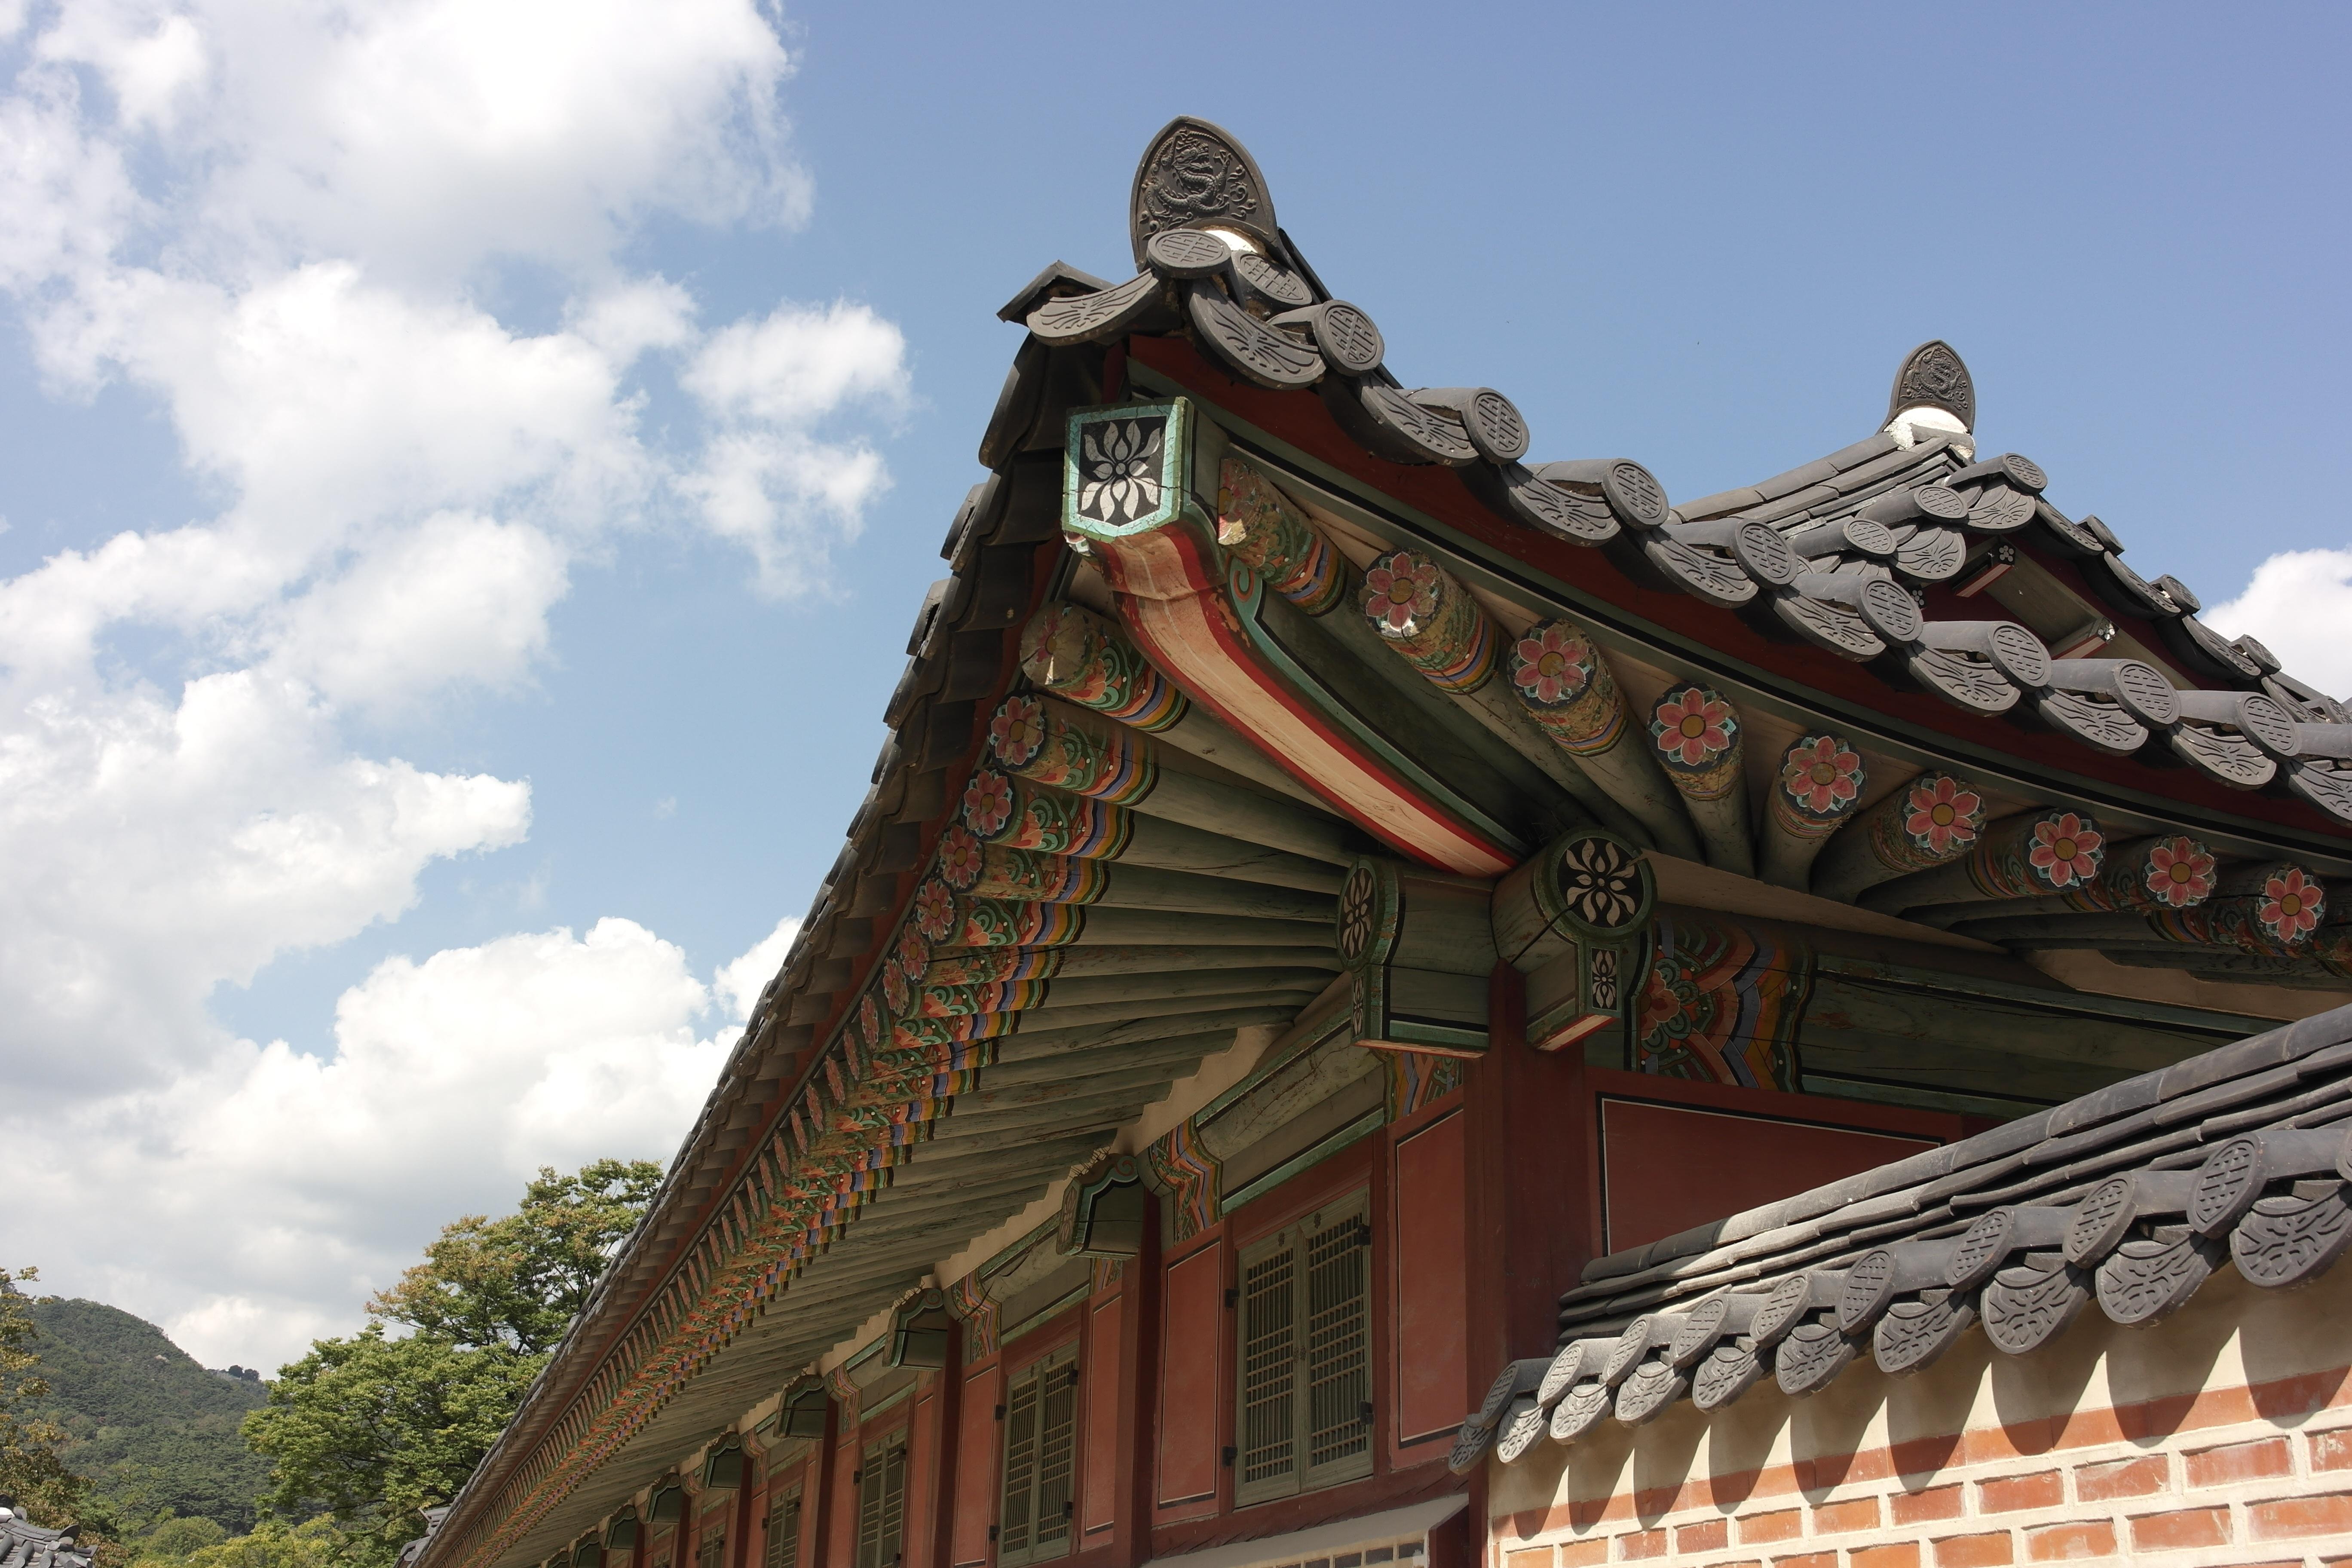 free images sky building landmark place of worship shrine